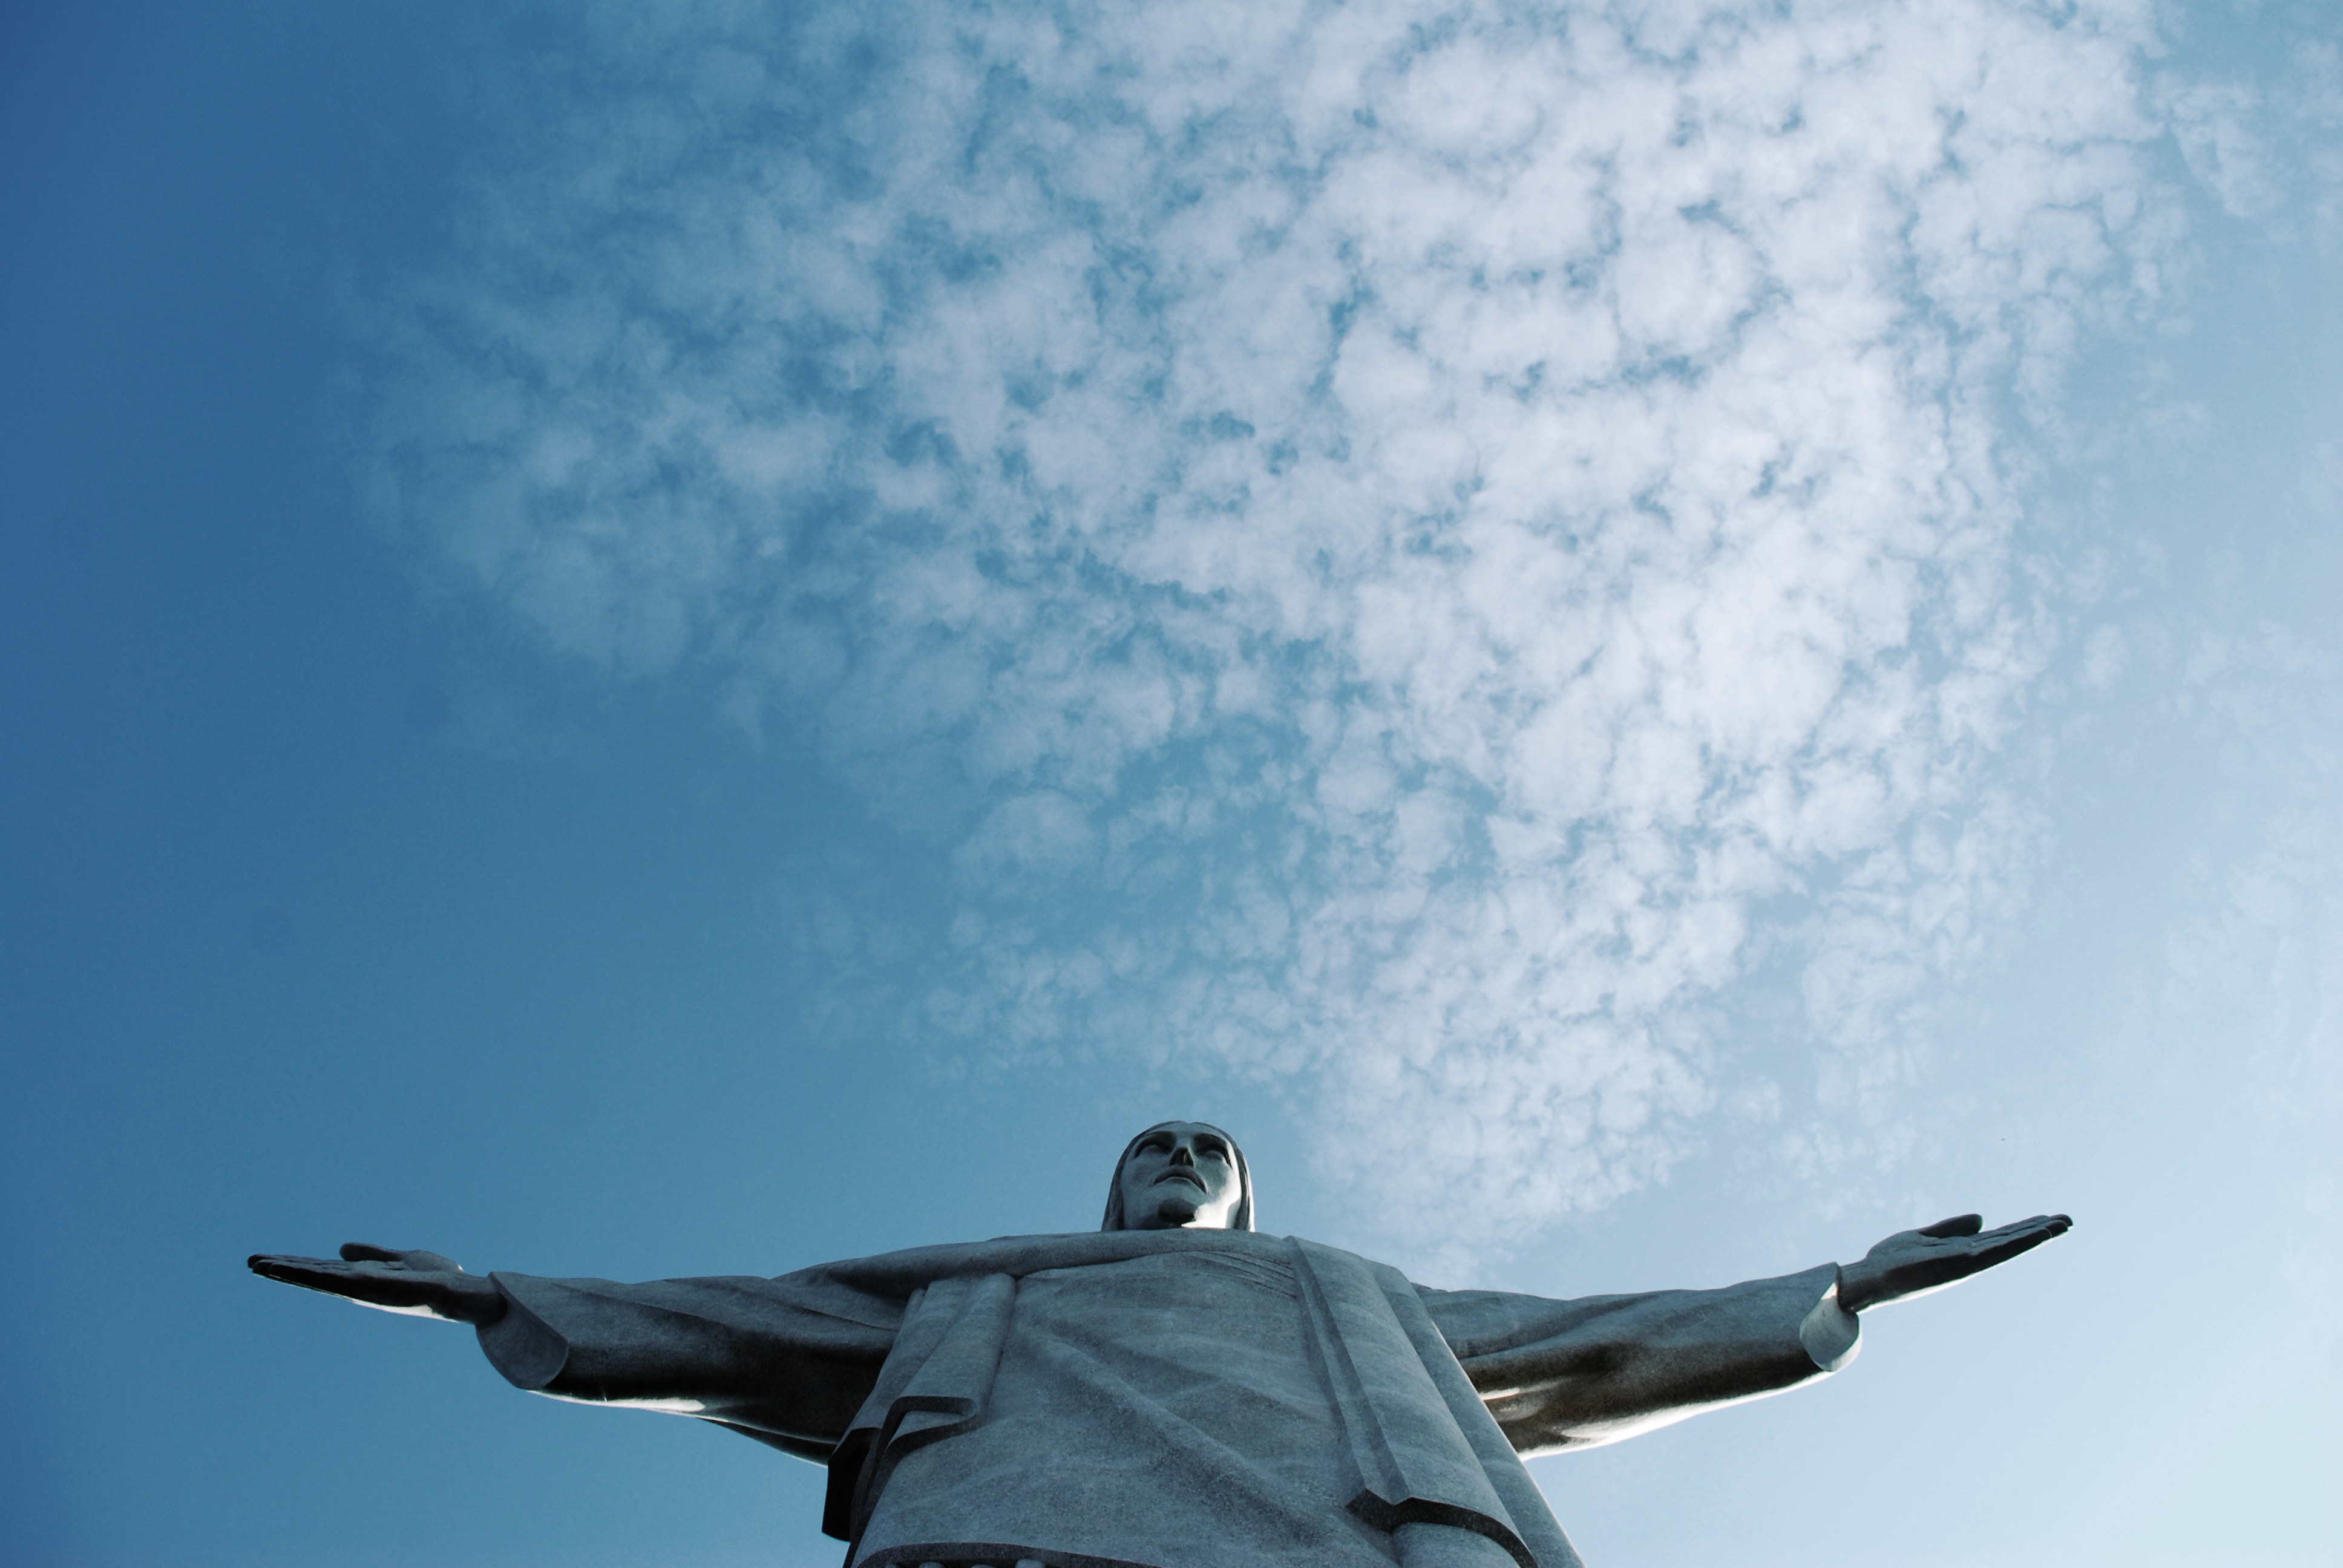 canva-christ-the-redeemer-in-rio-de-janeiro